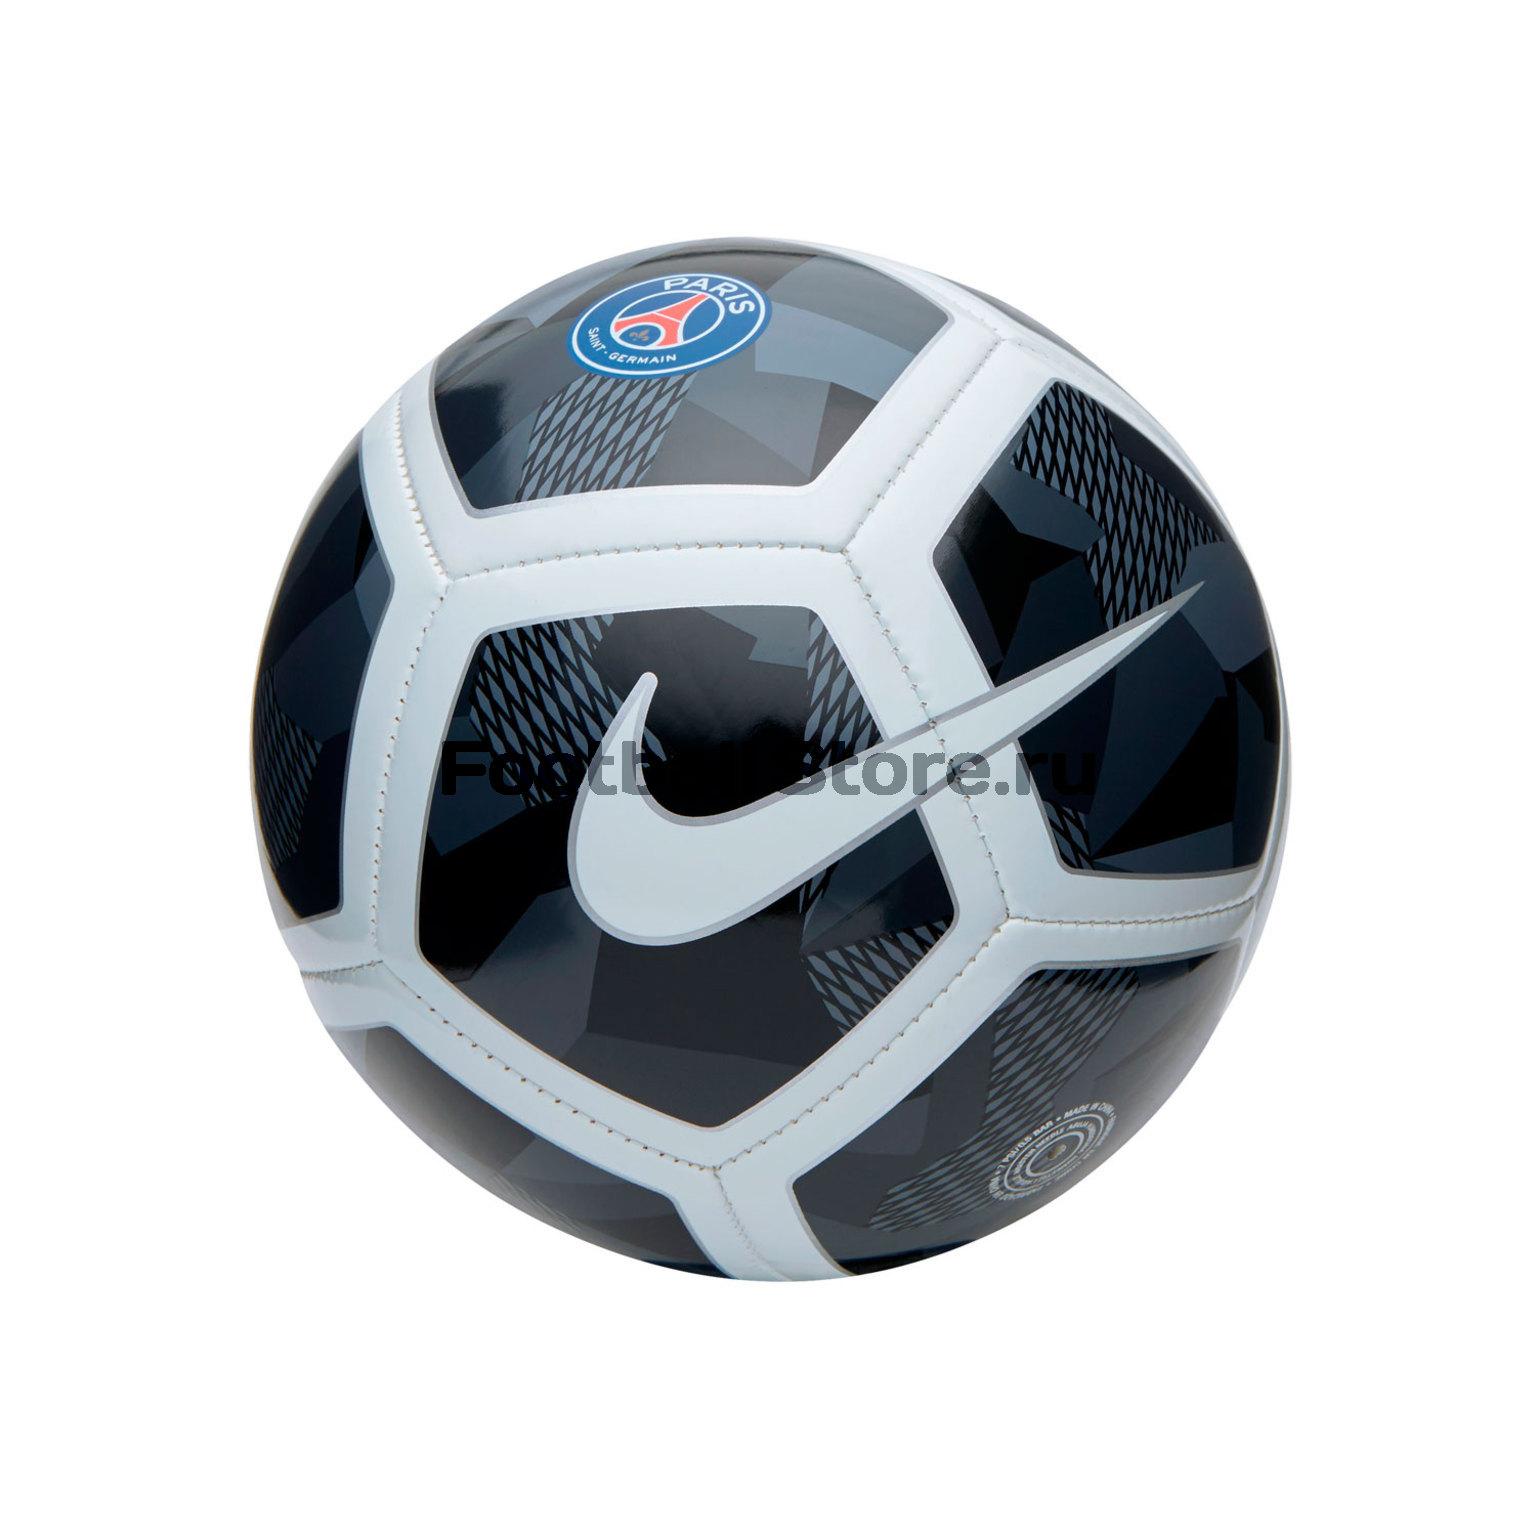 Мяч сувенирный Nike PSG SC3122-006 psg nike гетры nike psg stadium sx6033 429